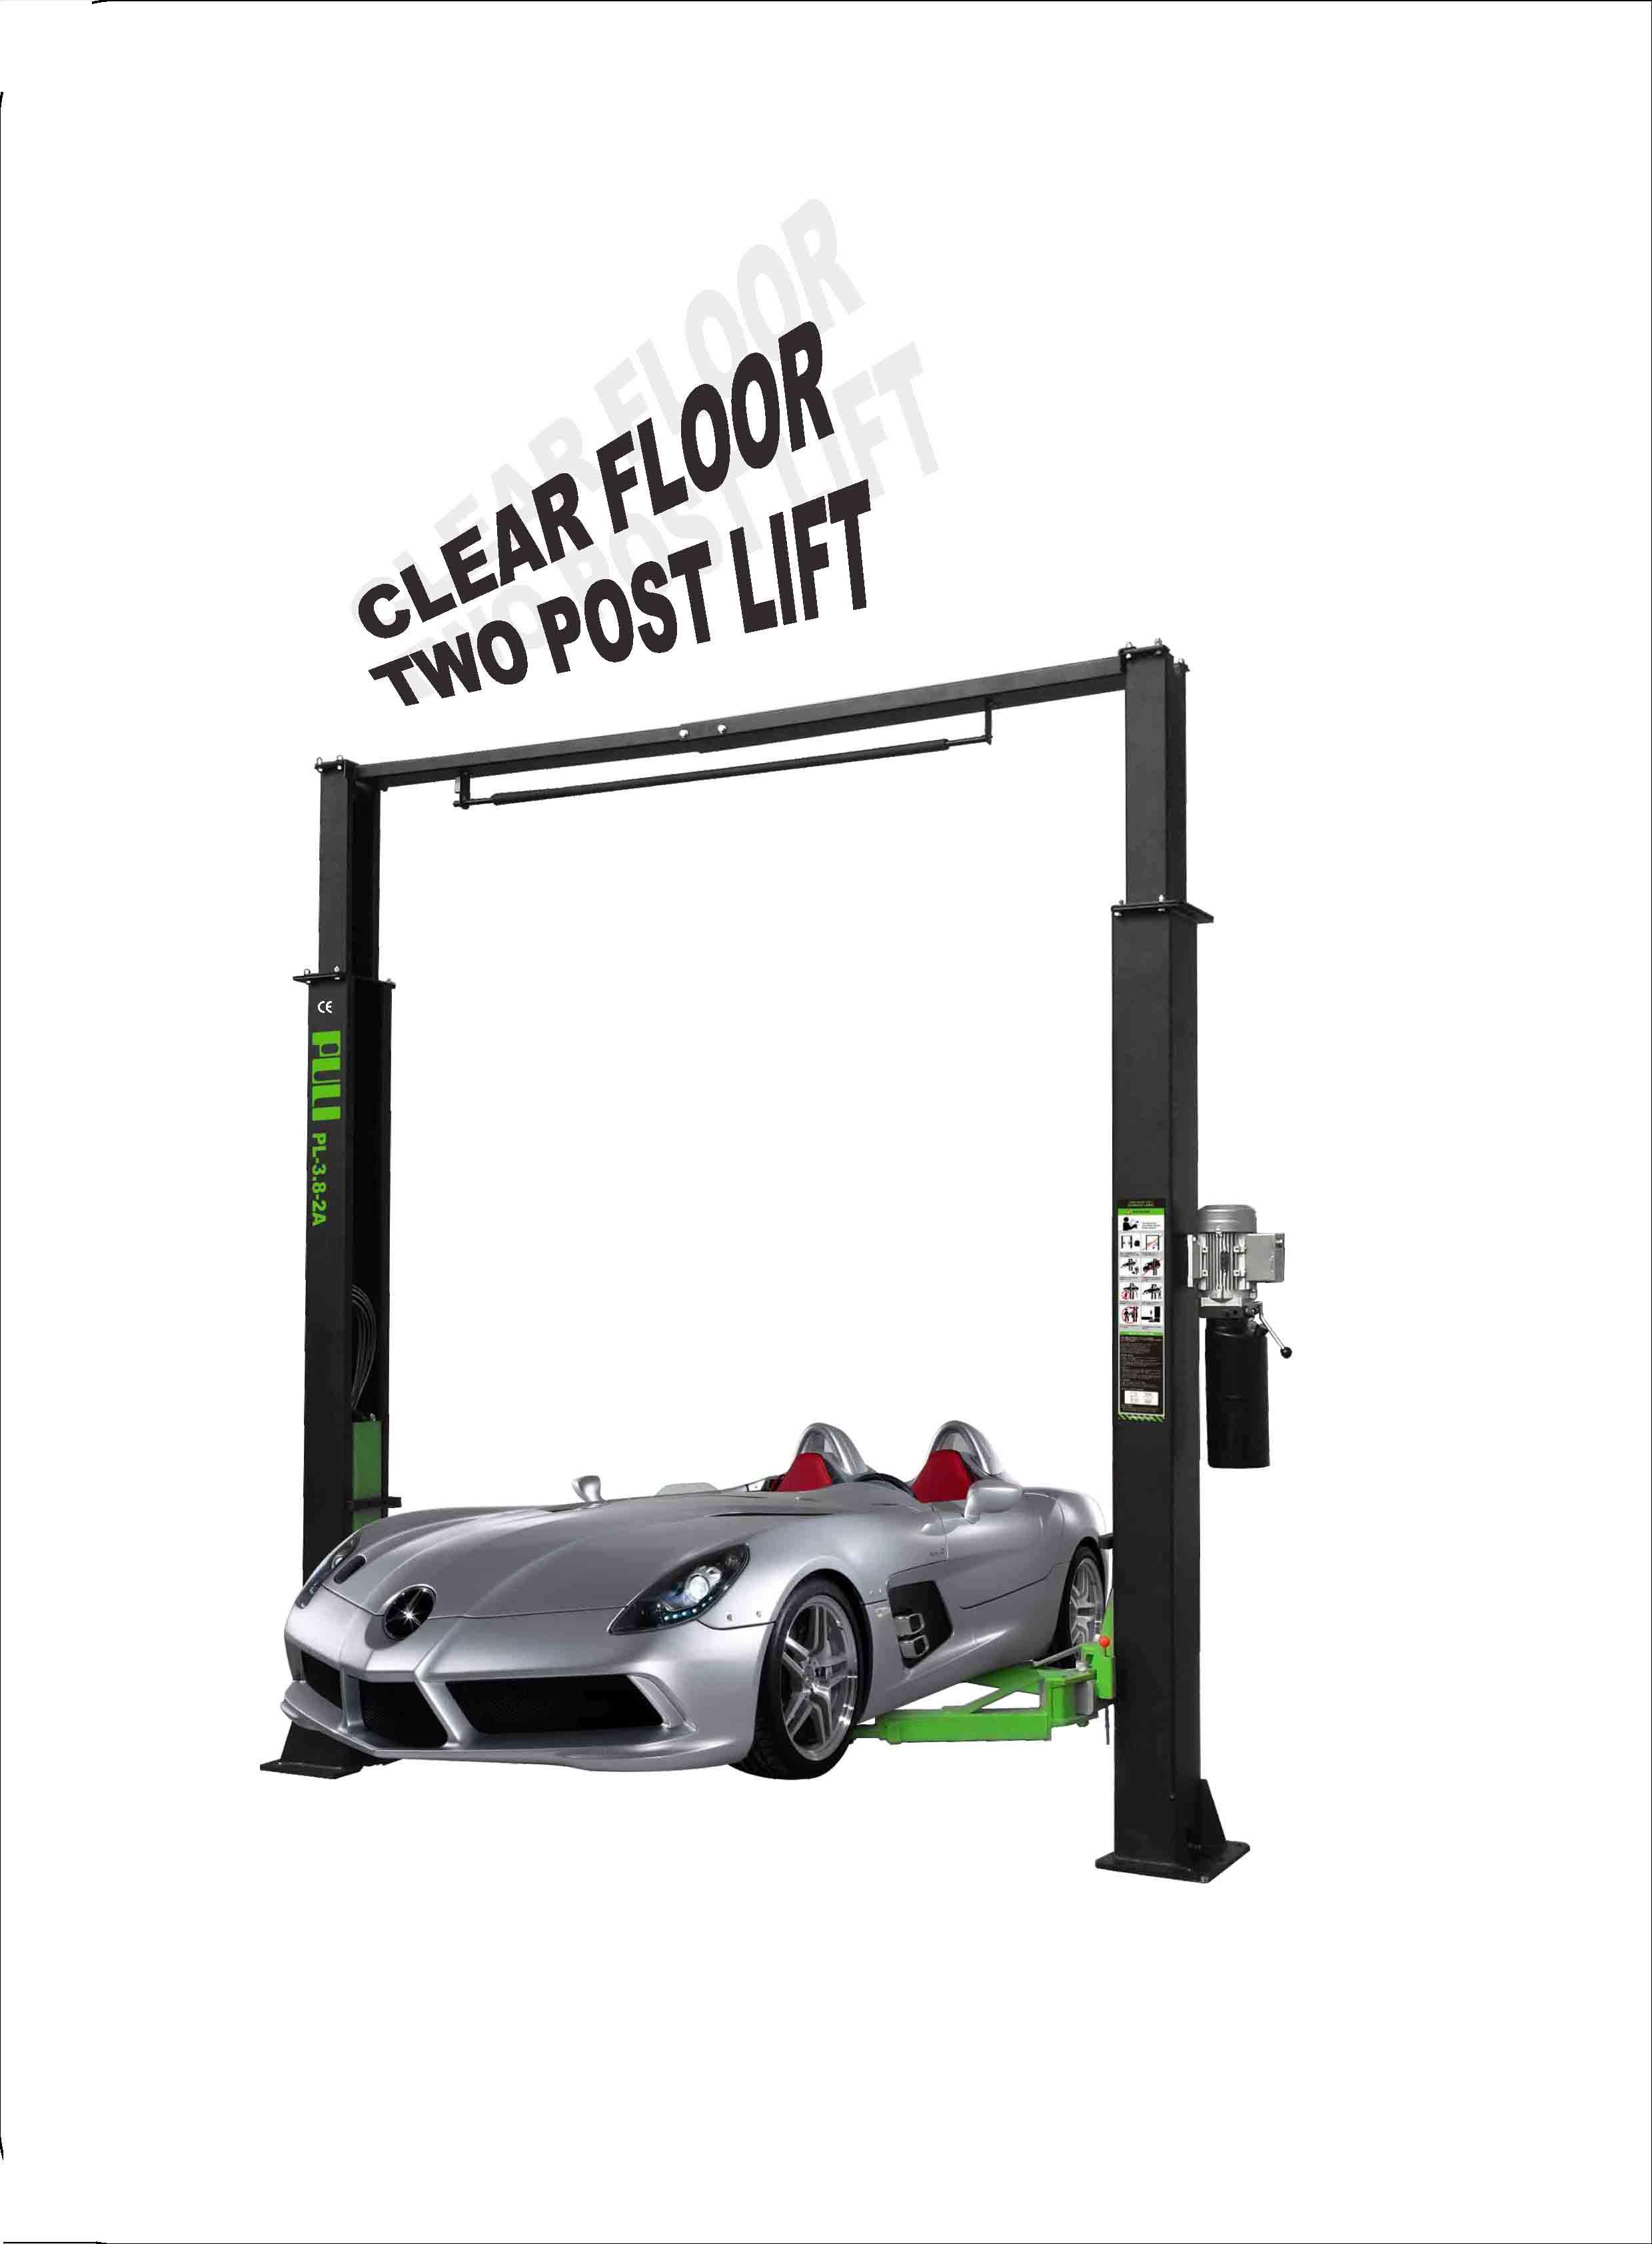 Glear Floor Two Post Lift